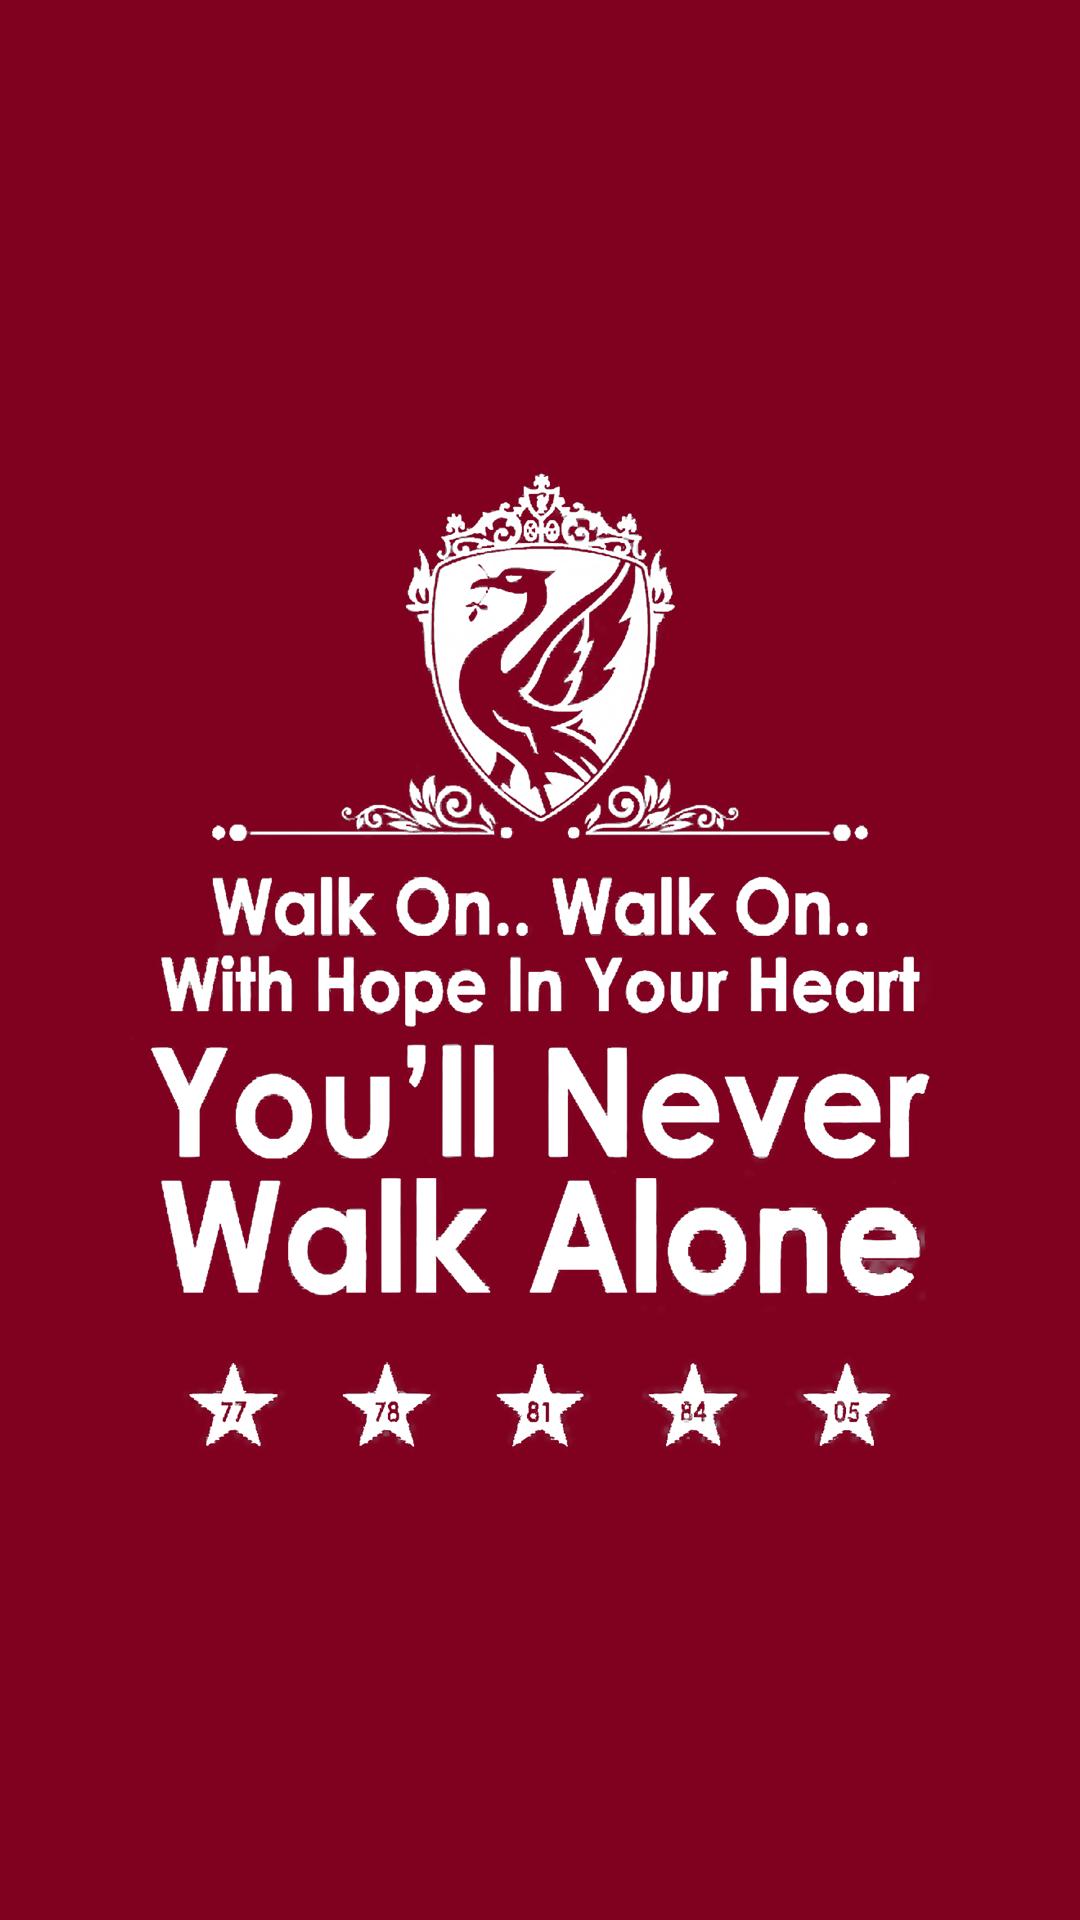 Liverpool Wallpaper You Never Walk Alone Hd Football